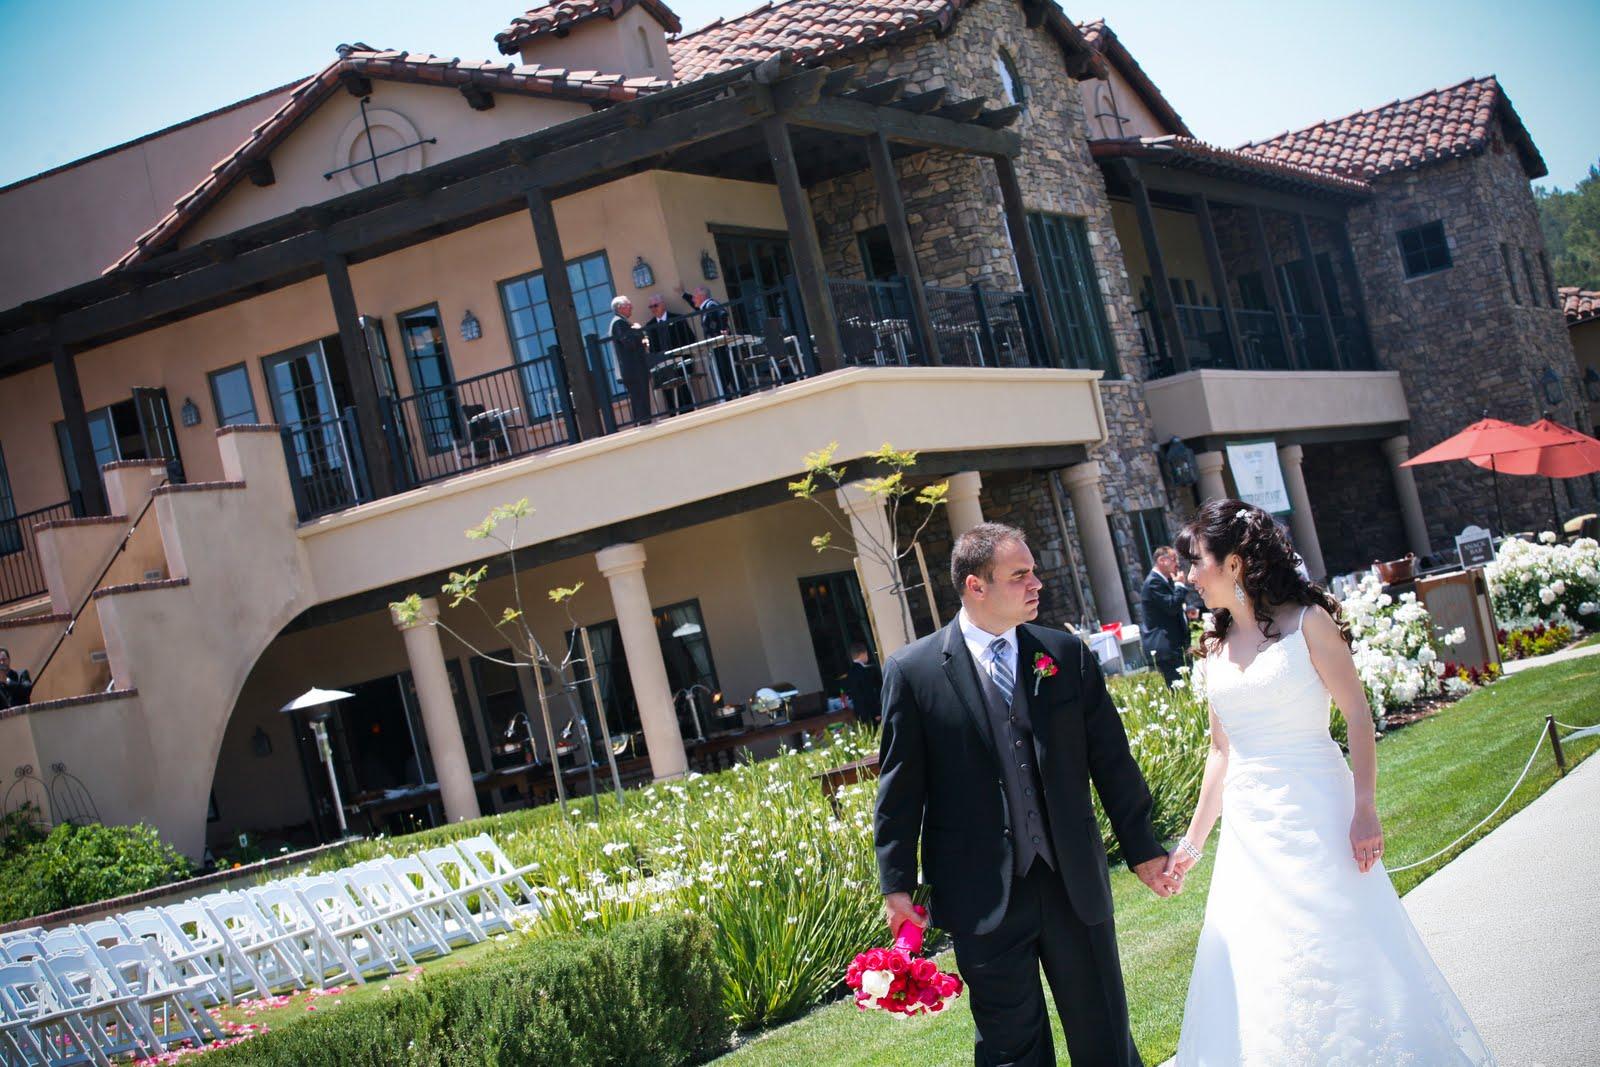 Orange County Wedding Photographer Photoblog By Jaimee Hubert Of Http Www Capturingmoments